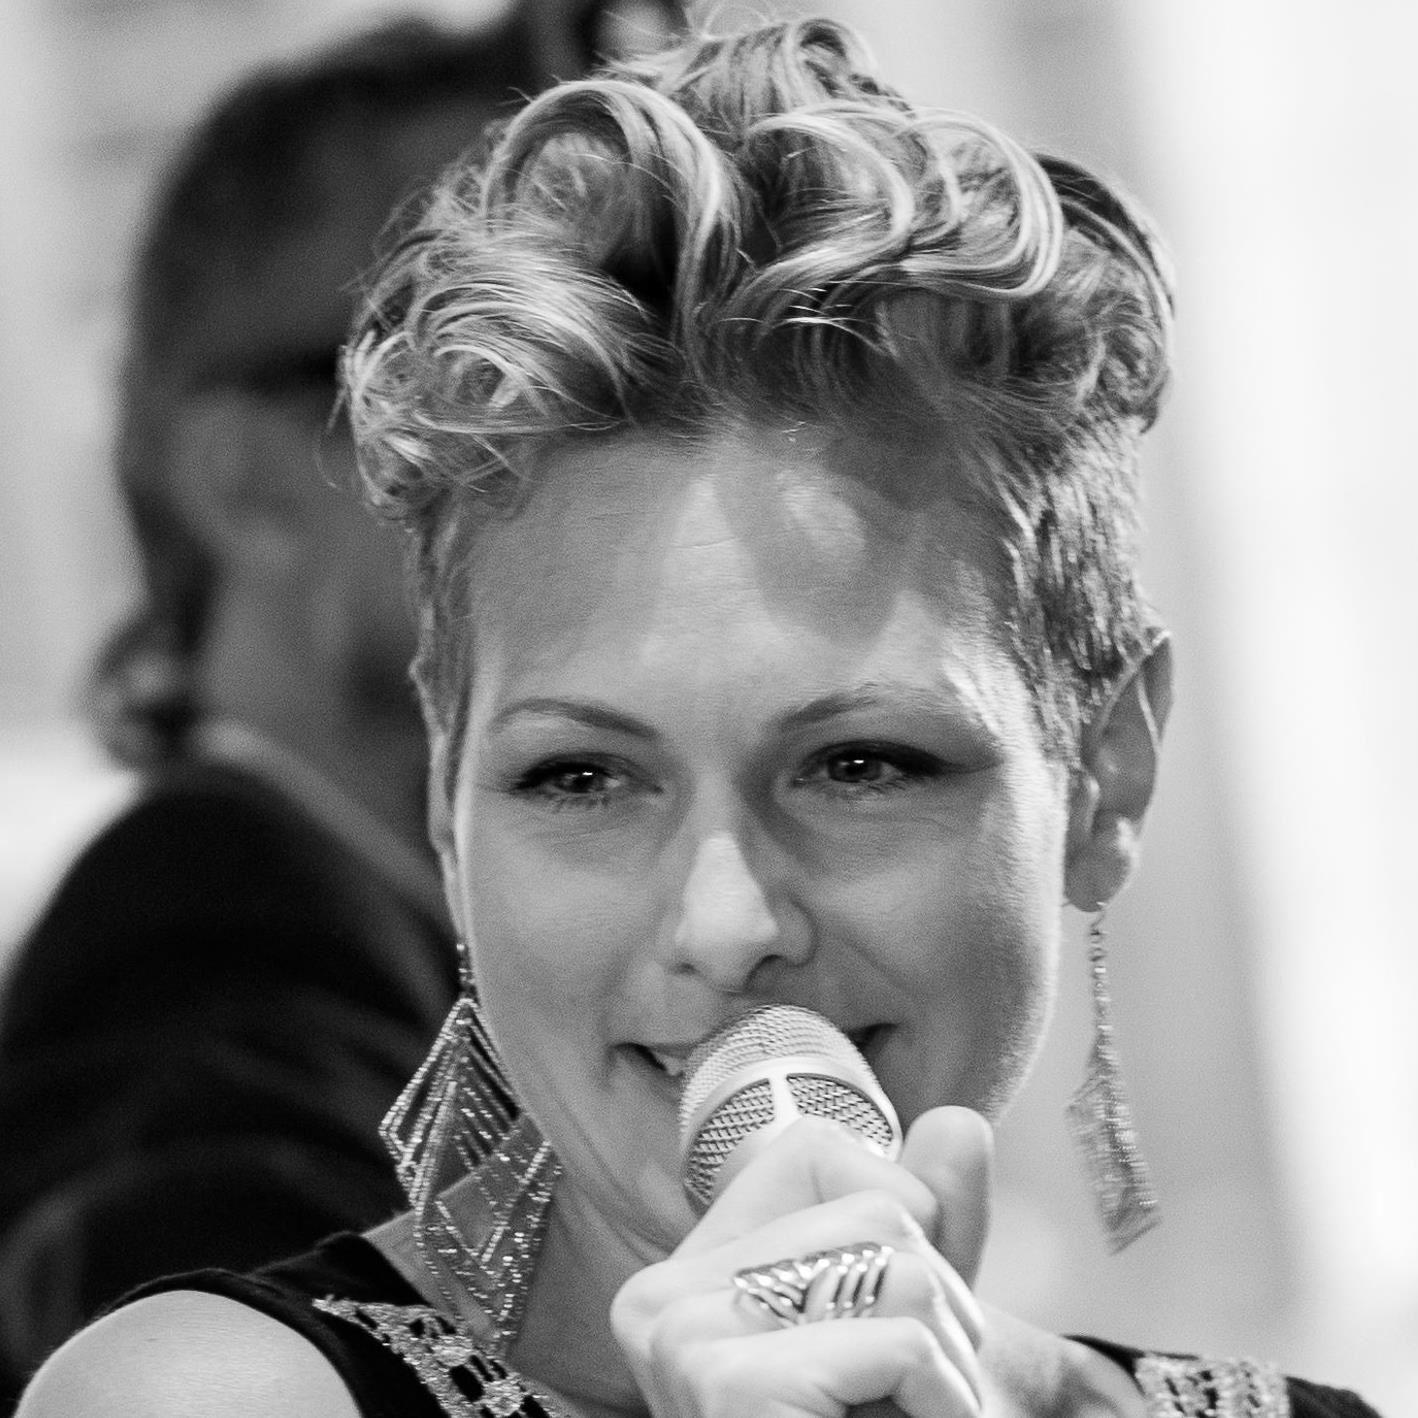 Ludvika jazzklubb - Åstrand & Erlandsson duo presenterar Lena Swanberg